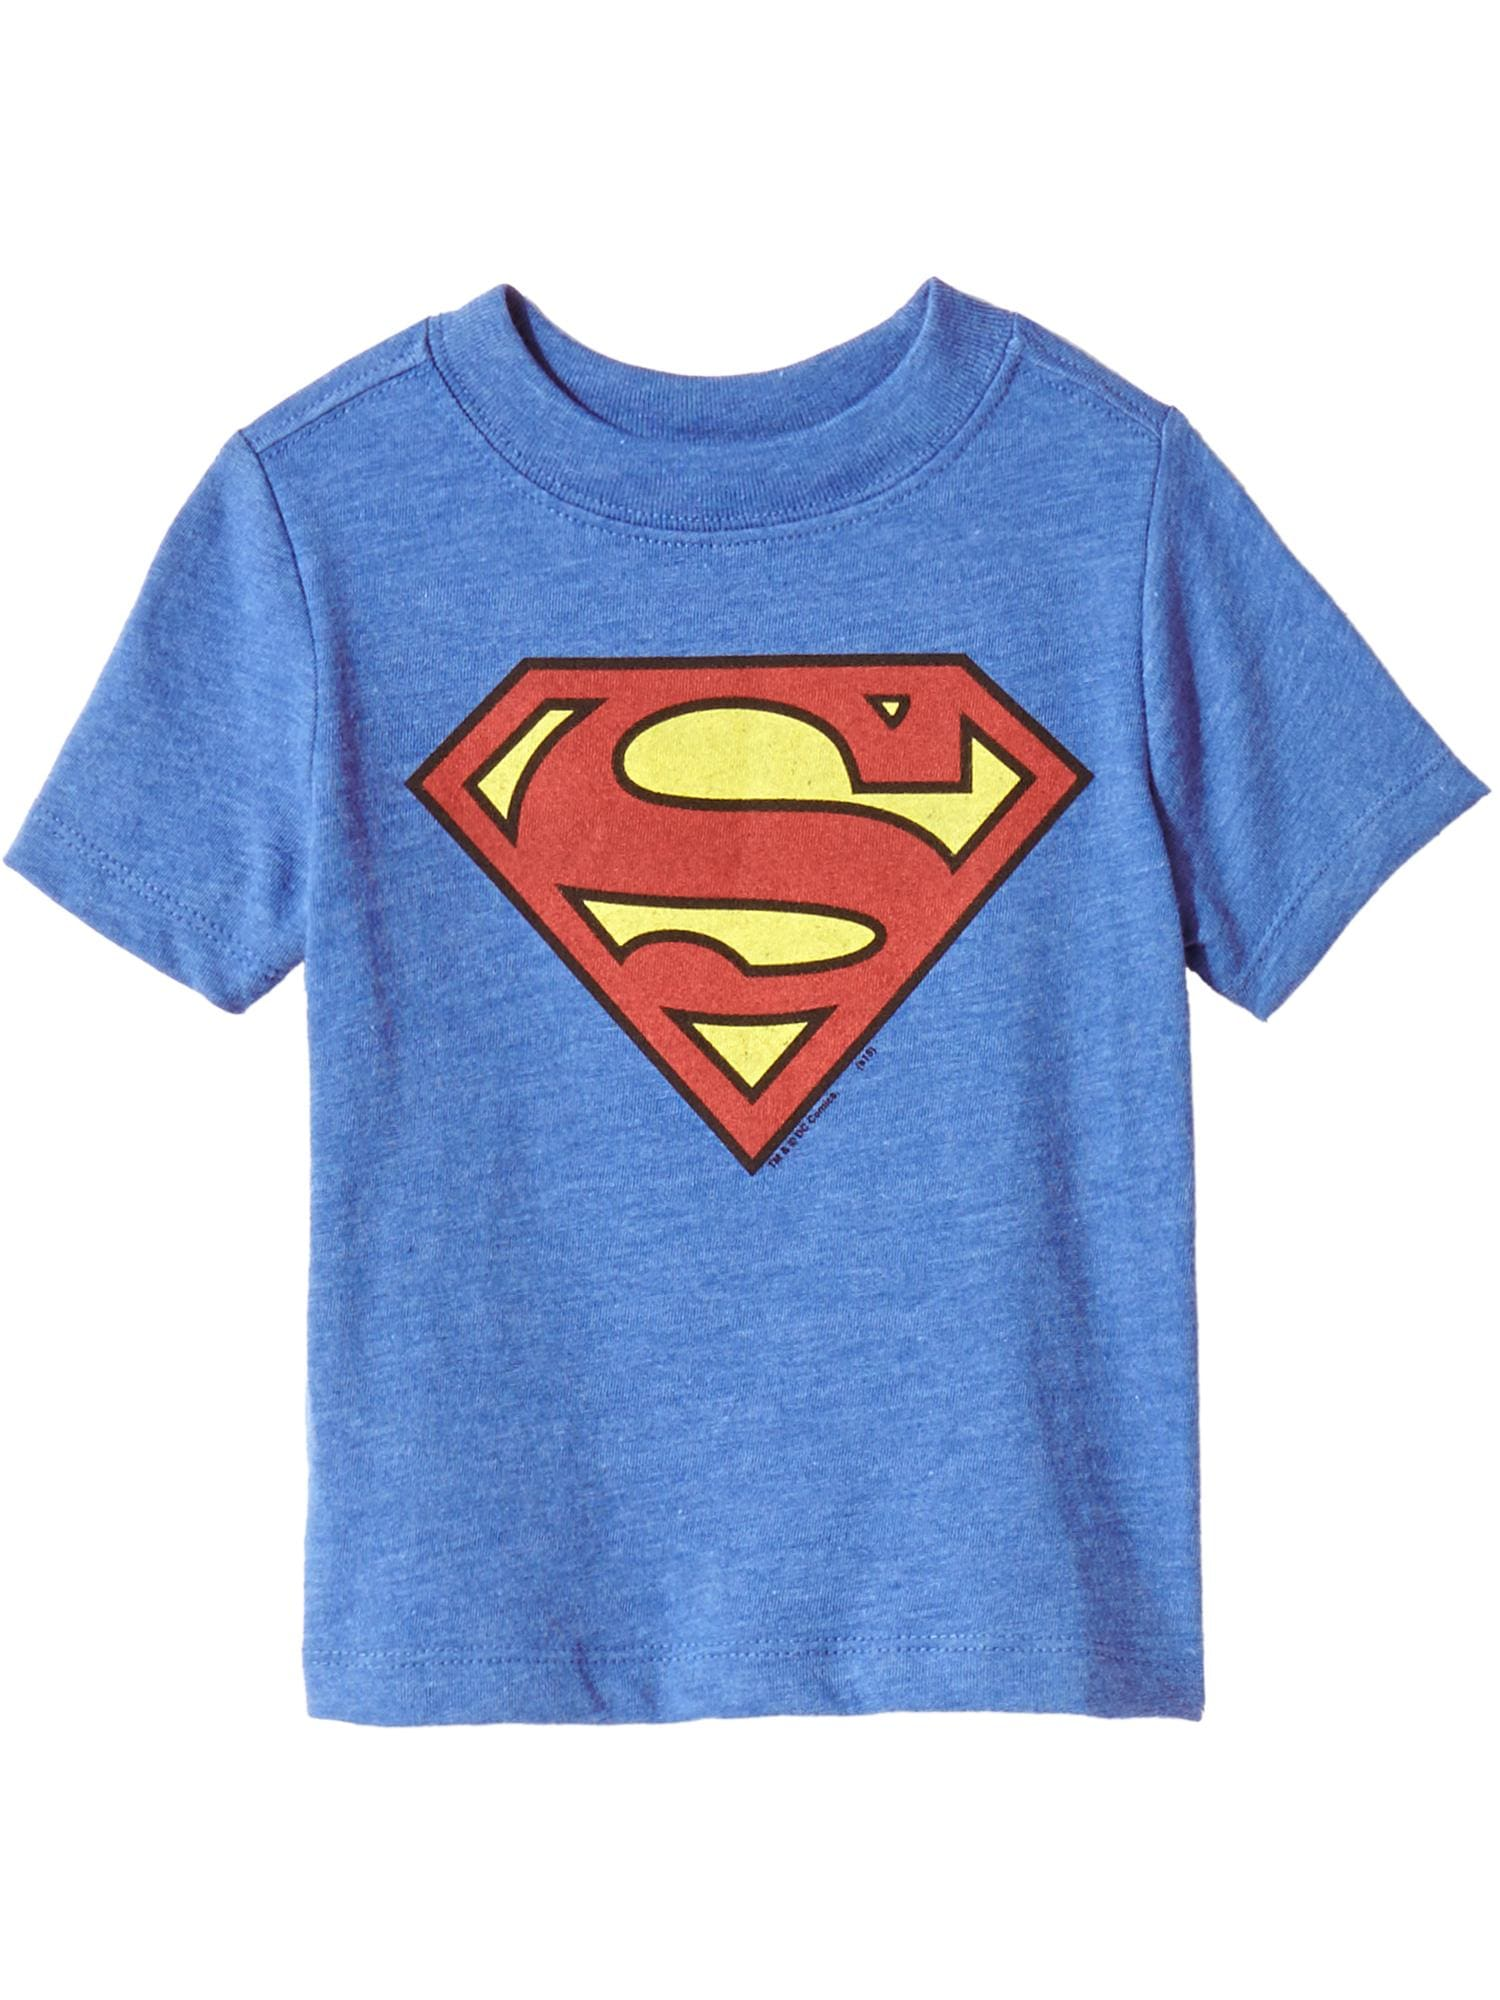 Justice League Superman Logo Boy/'s Navy T-Shirt Kids DC Superhero Tee